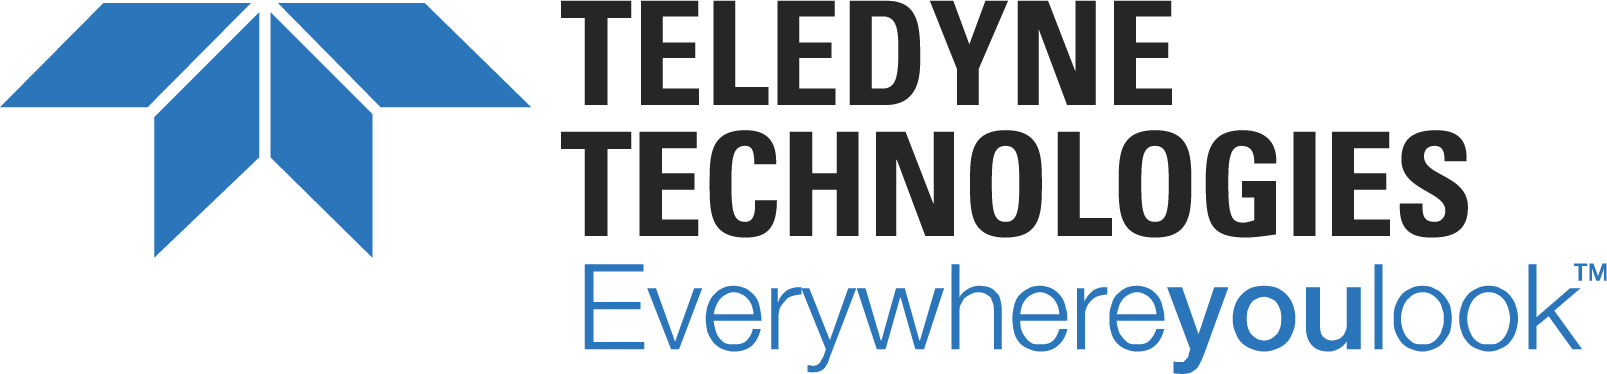 Teledyne Technologies Logo png